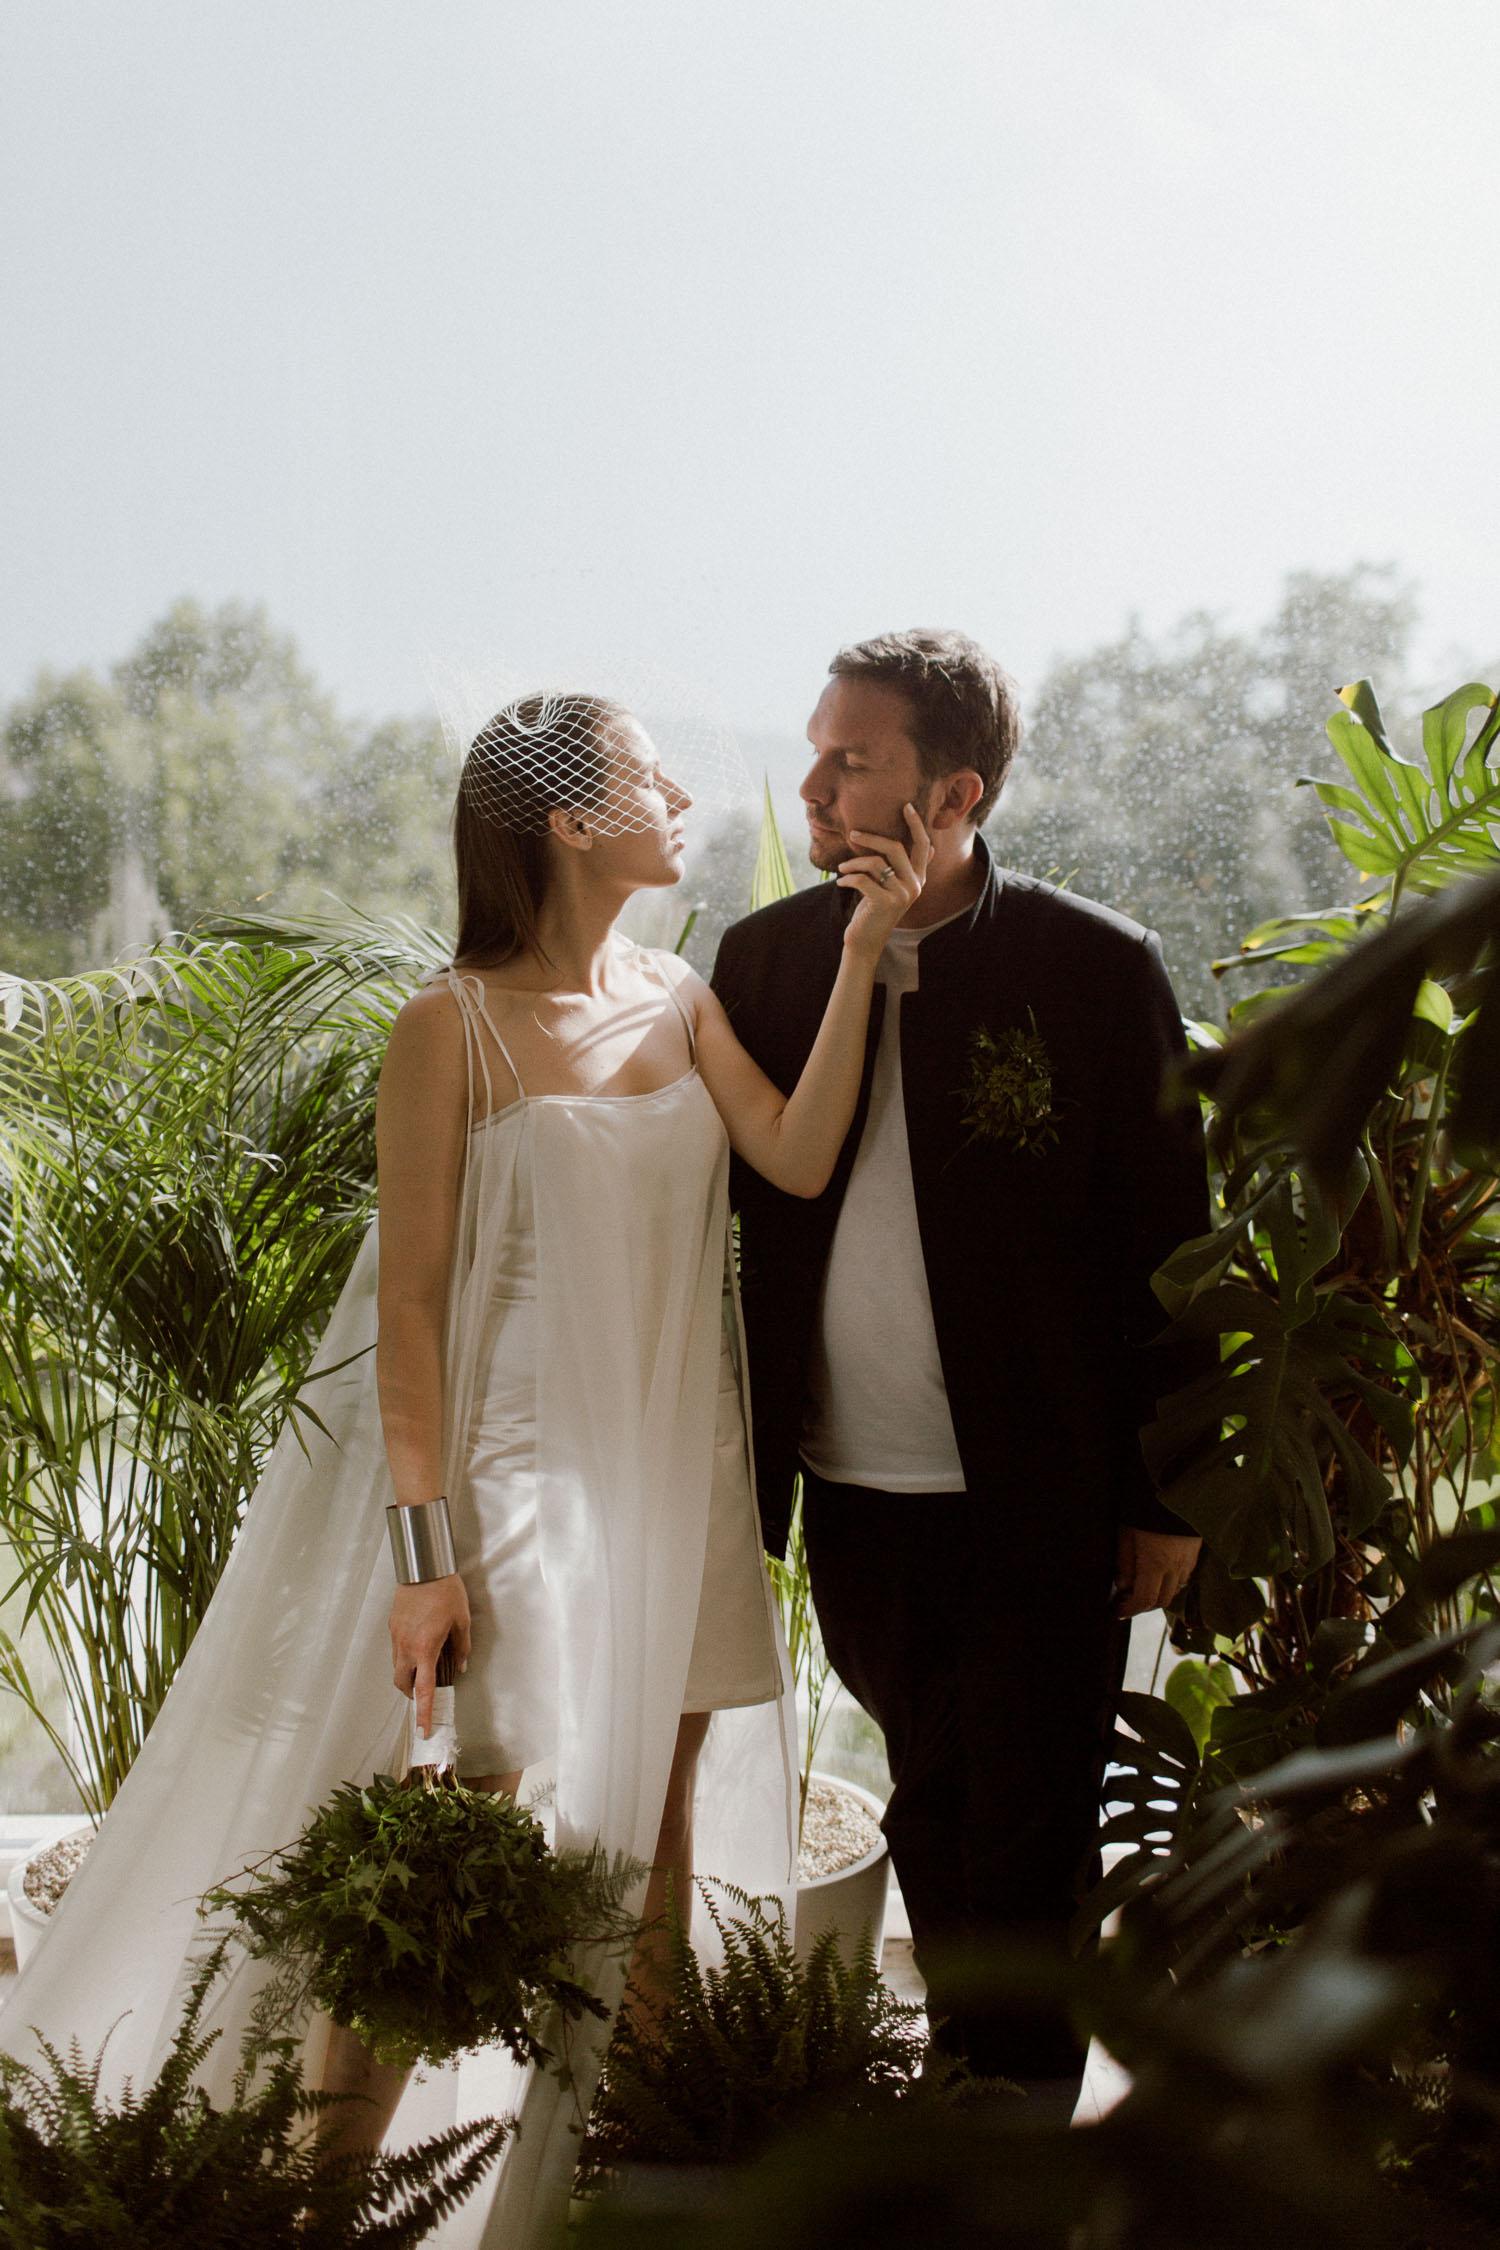 everbay-vila-tugendhat-wedding-svatba-110-2.jpg